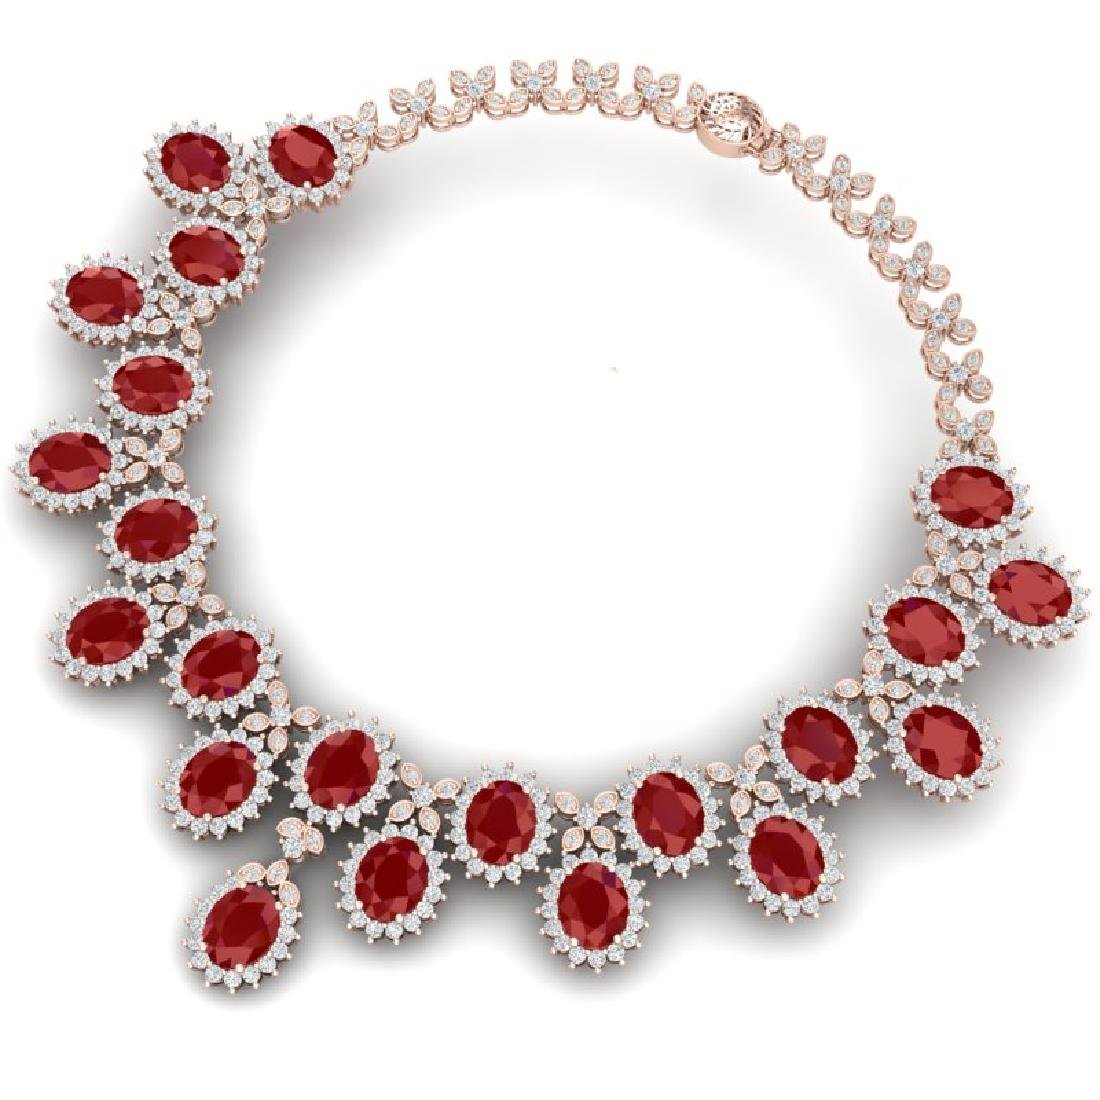 81 CTW Royalty Designer Ruby & VS Diamond Necklace 18K - 3